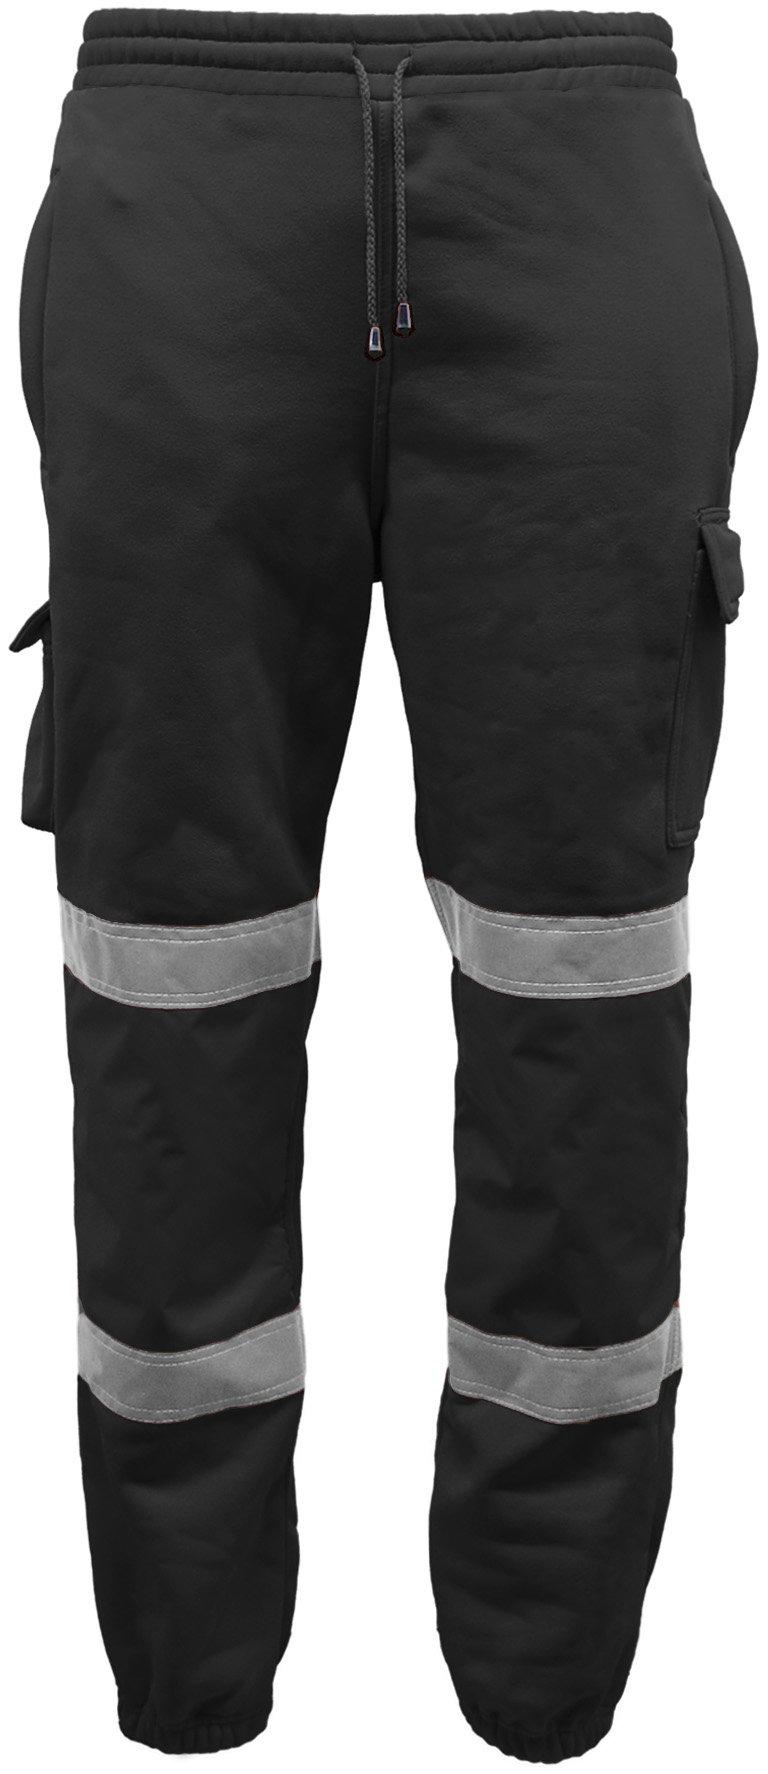 Men/'s Safety Sweat Pants Hi Viz Vis Work Fleece Bottoms Jogging Trousers Joggers